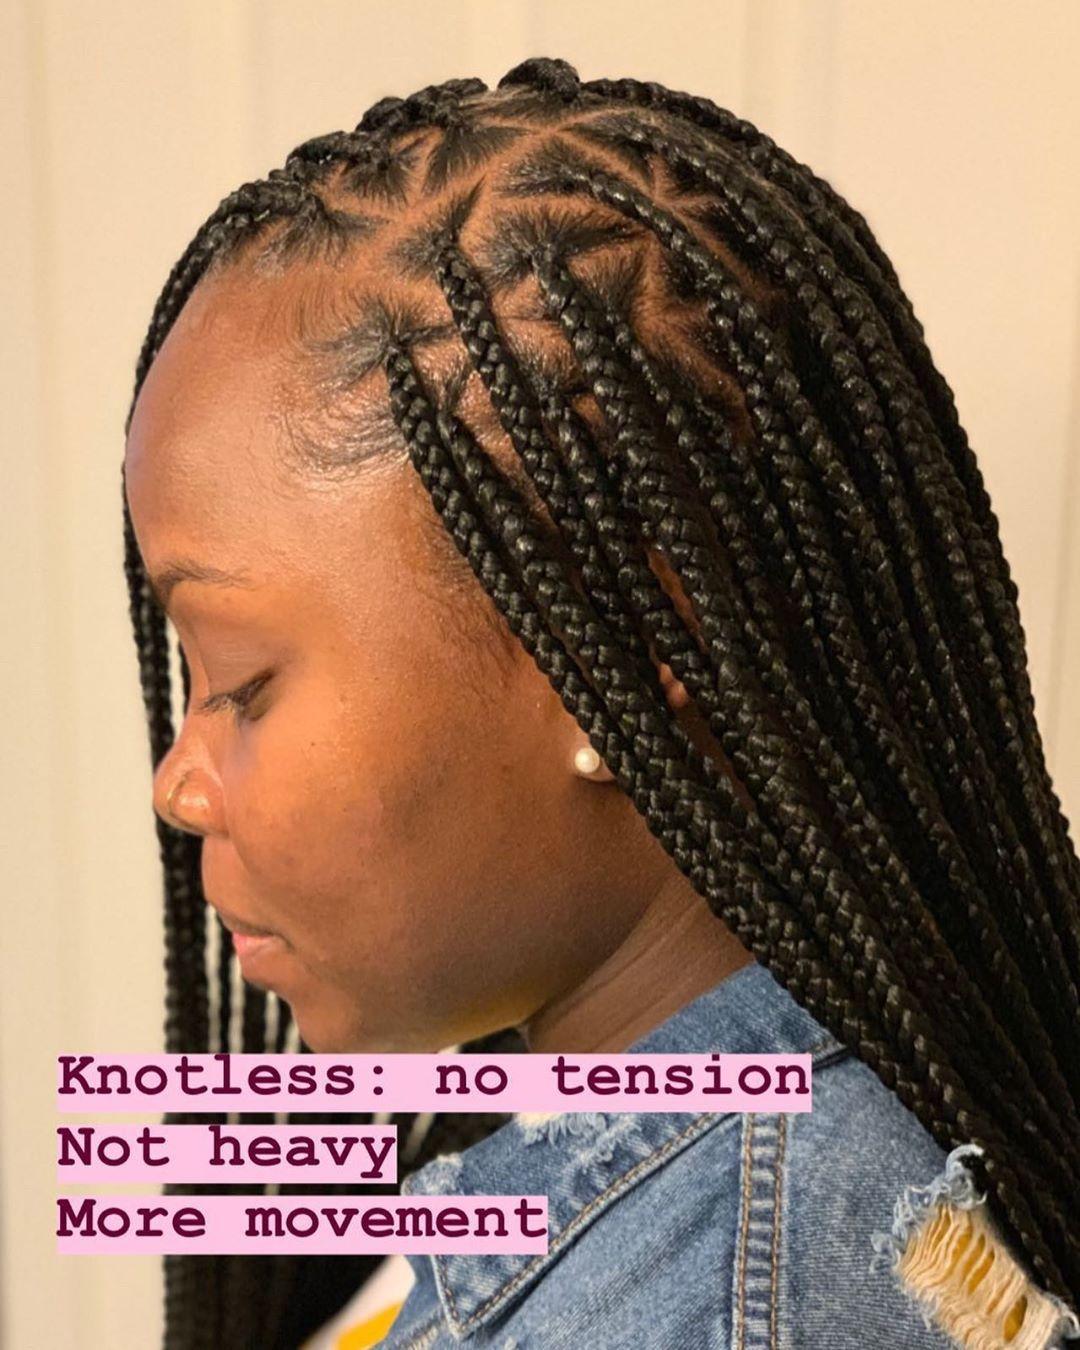 Https I Pinimg Com Originals 43 54 30 43543010d3a45d9a8edf944f34f91c3c Jpg In 2020 Braided Hairstyles Box Braids Styling Natural Hair Braids